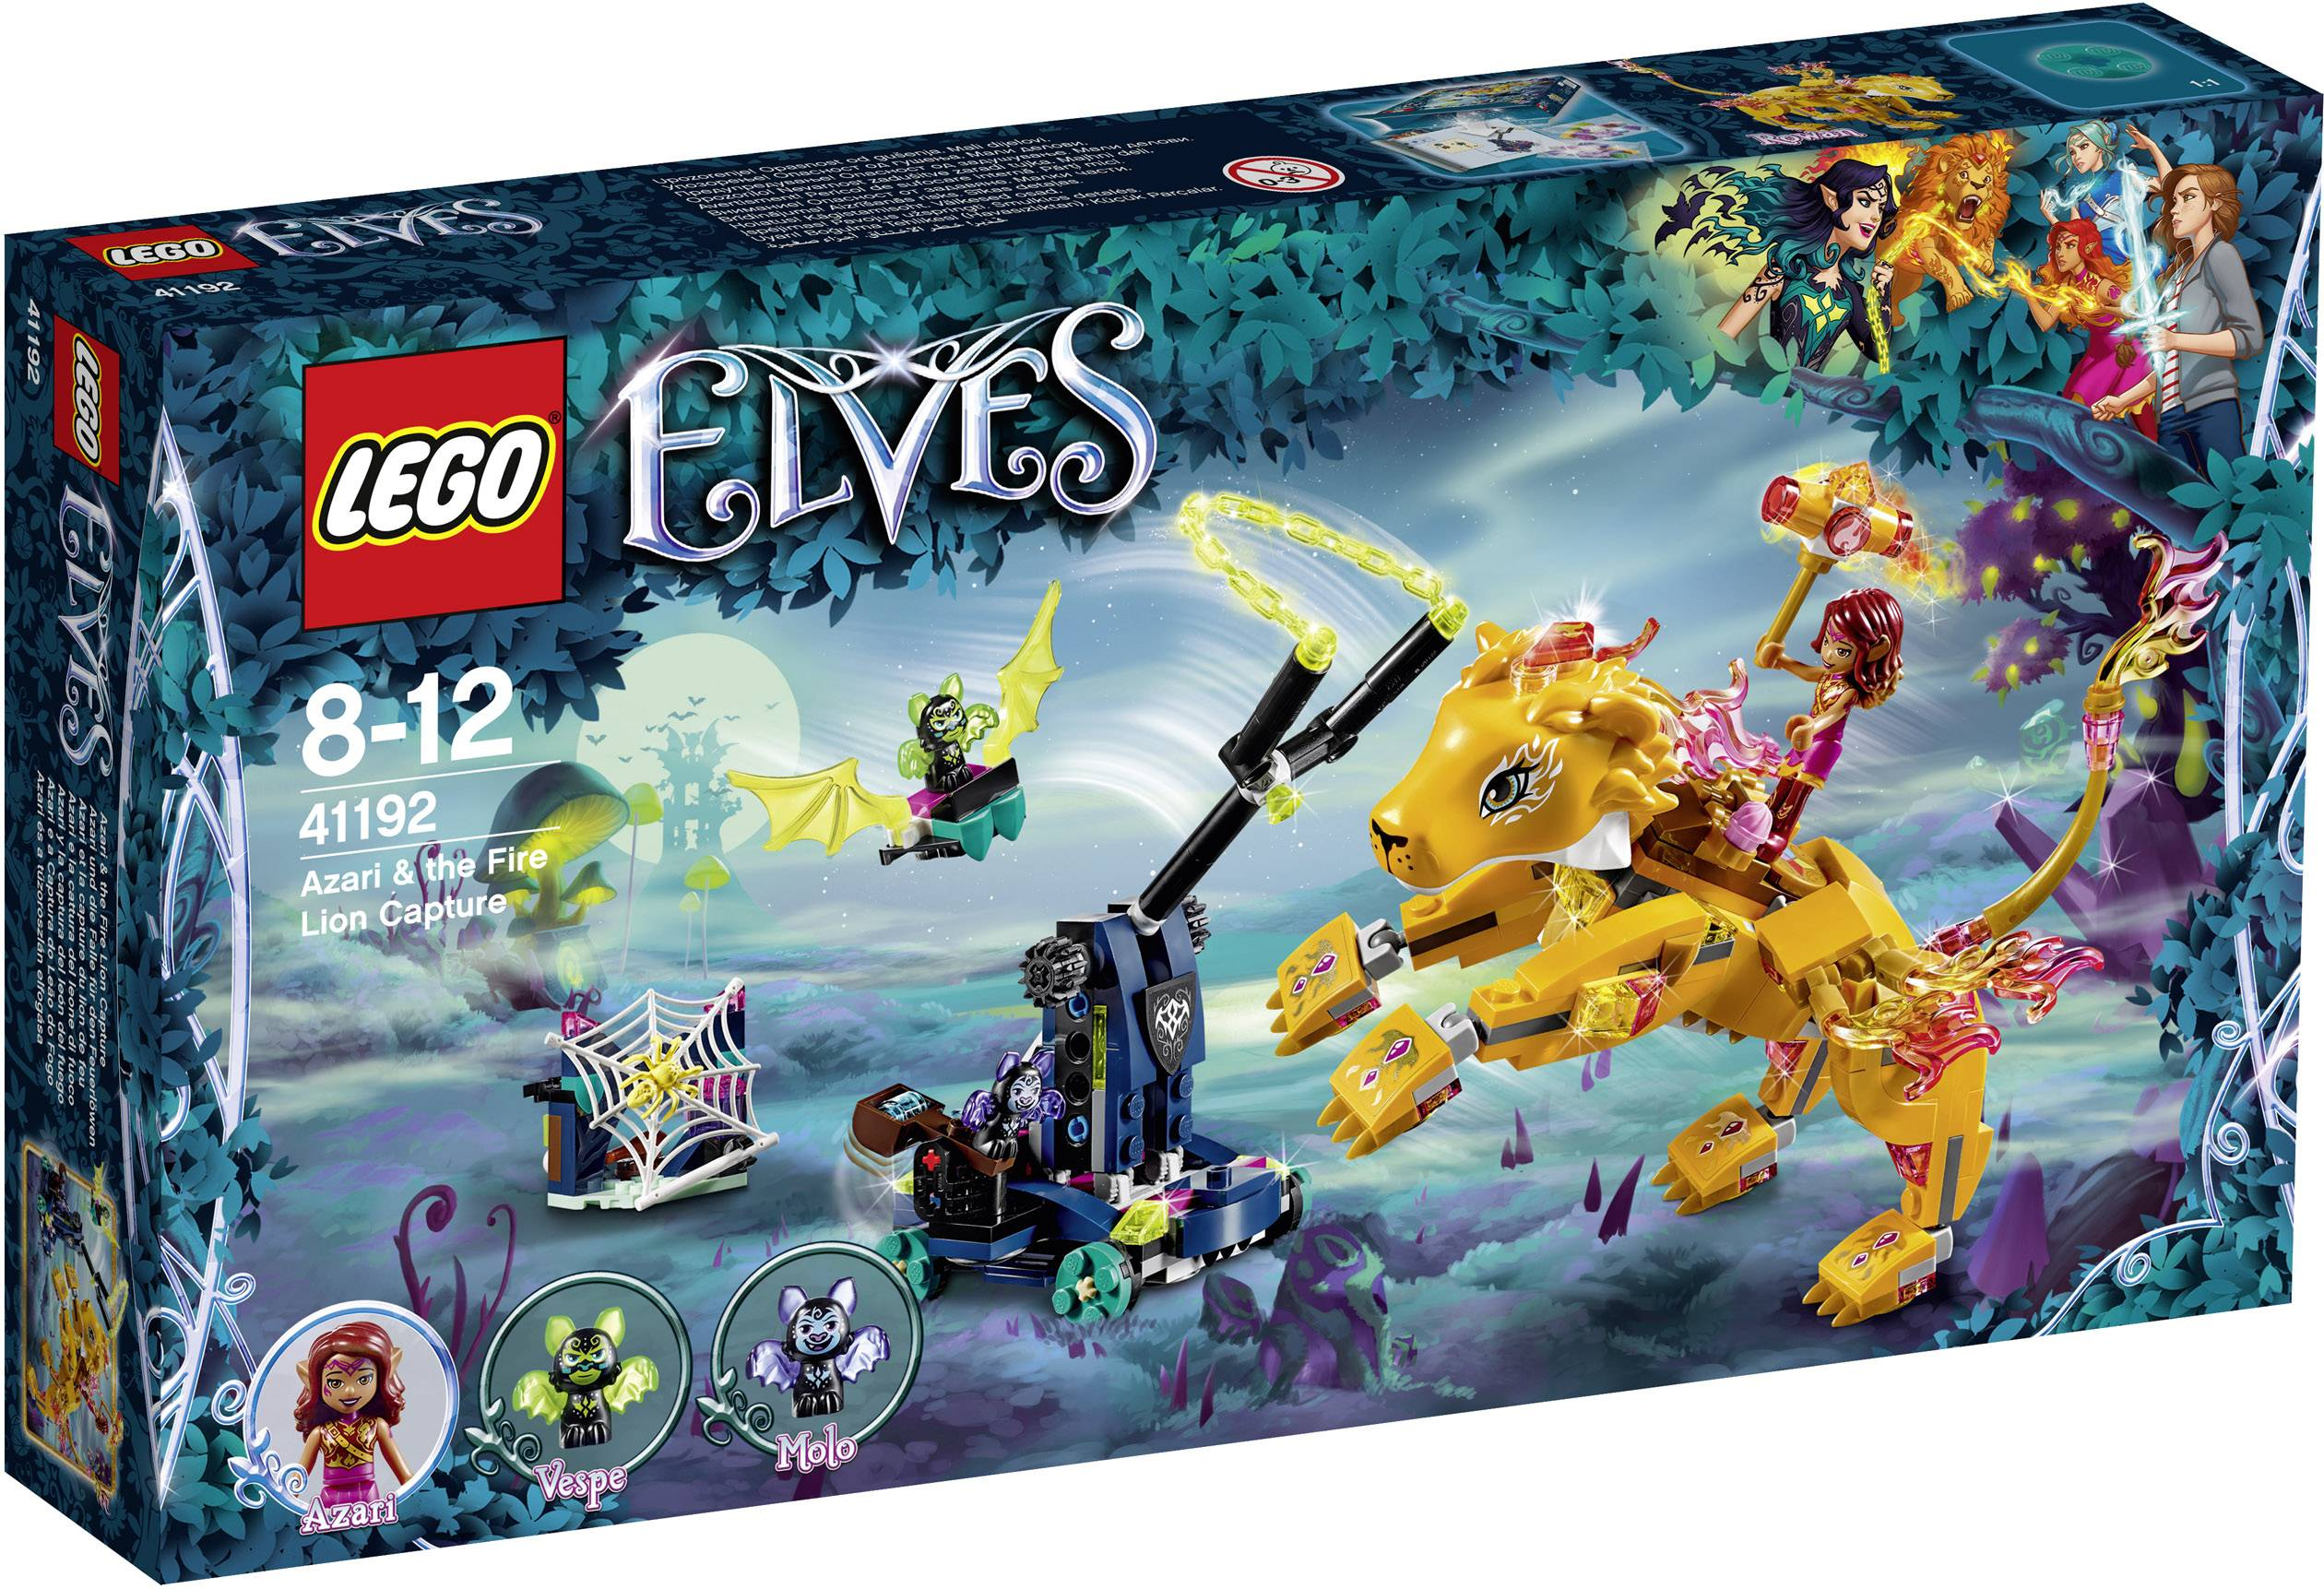 LEGO® ELVES 41192 Azari e la trapp